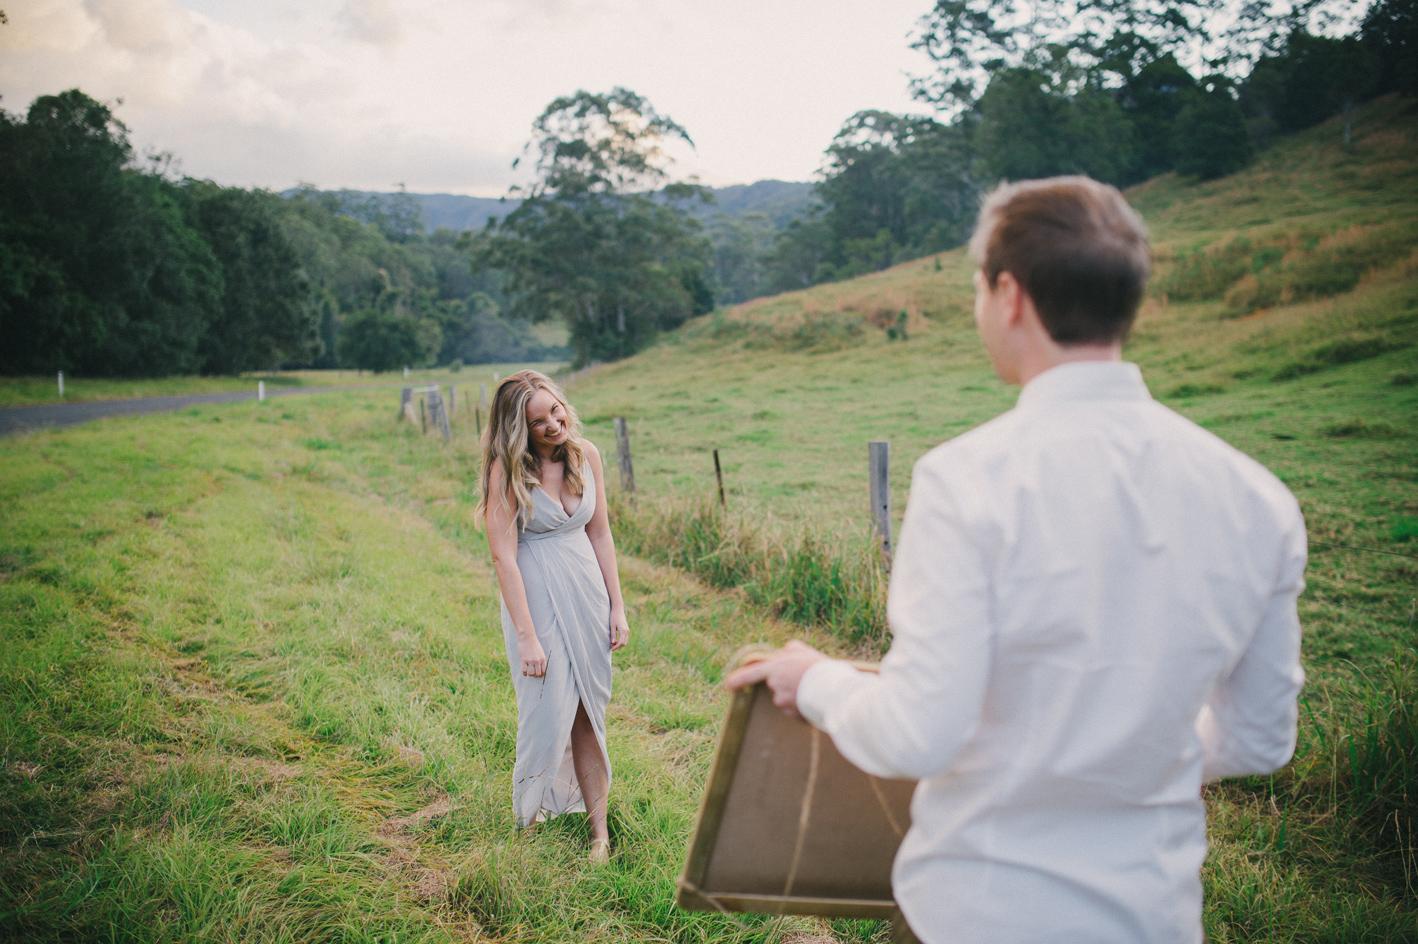 013-josh-shay-engagement-sophie-baker-photography